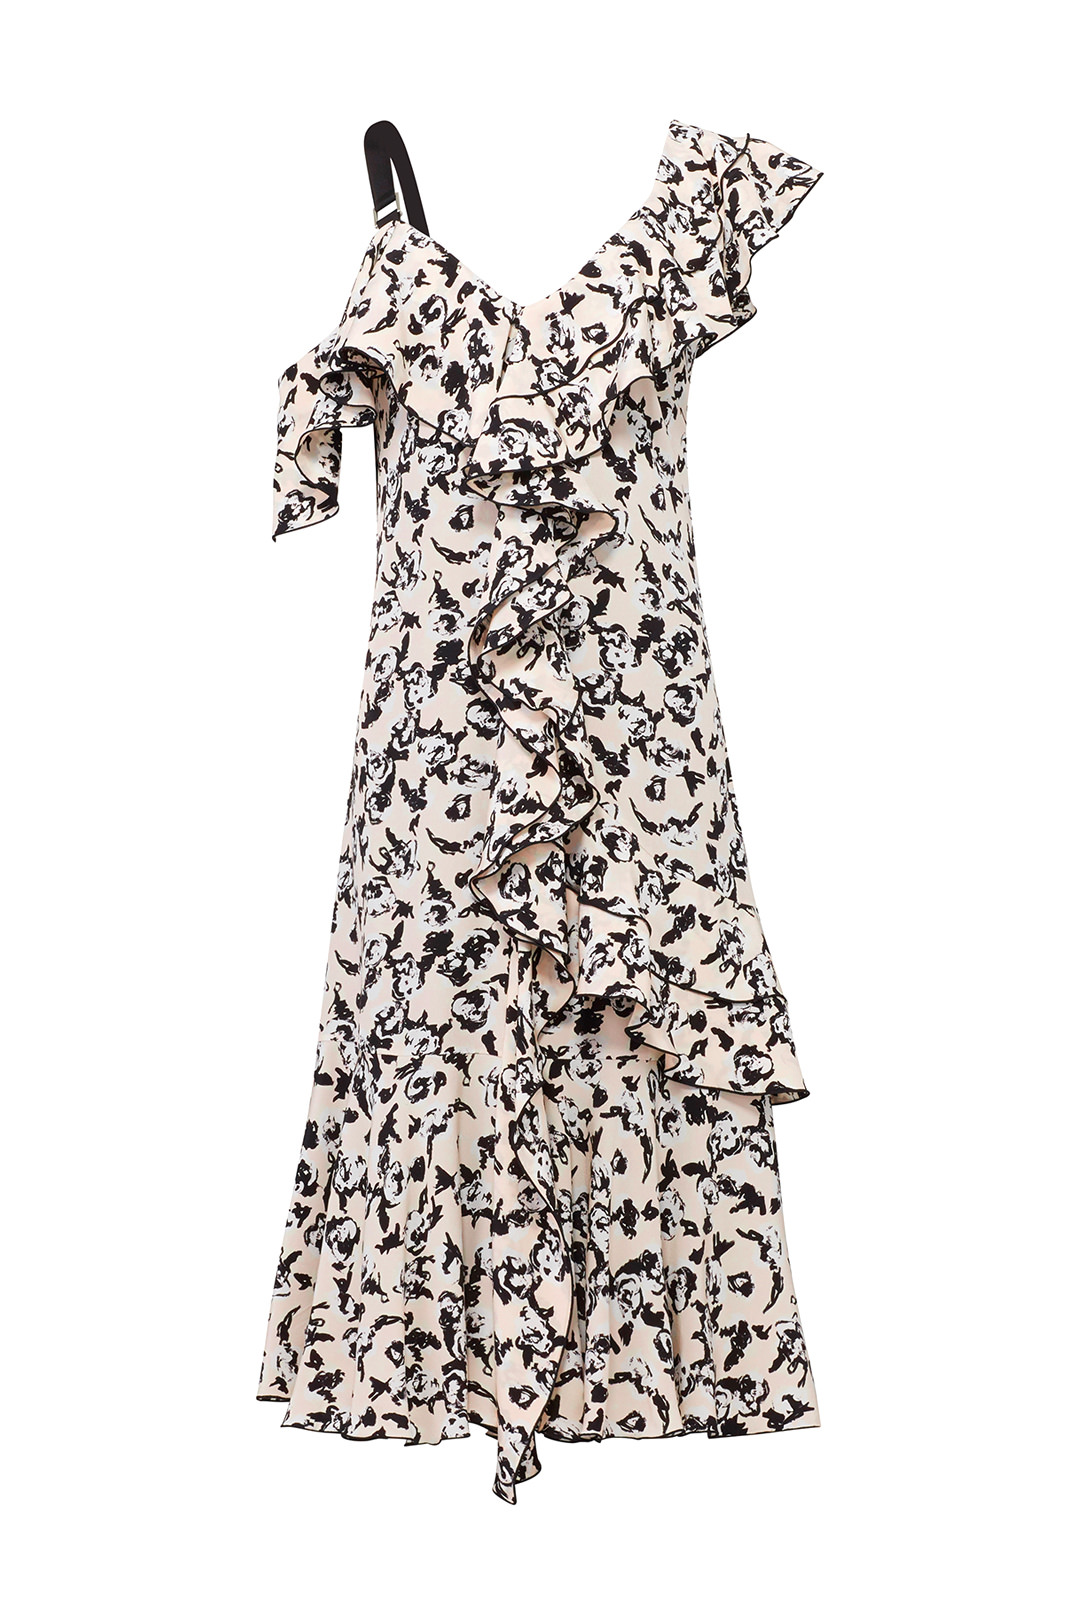 Copy of Scribble Rose Dress by Proenza Schouler